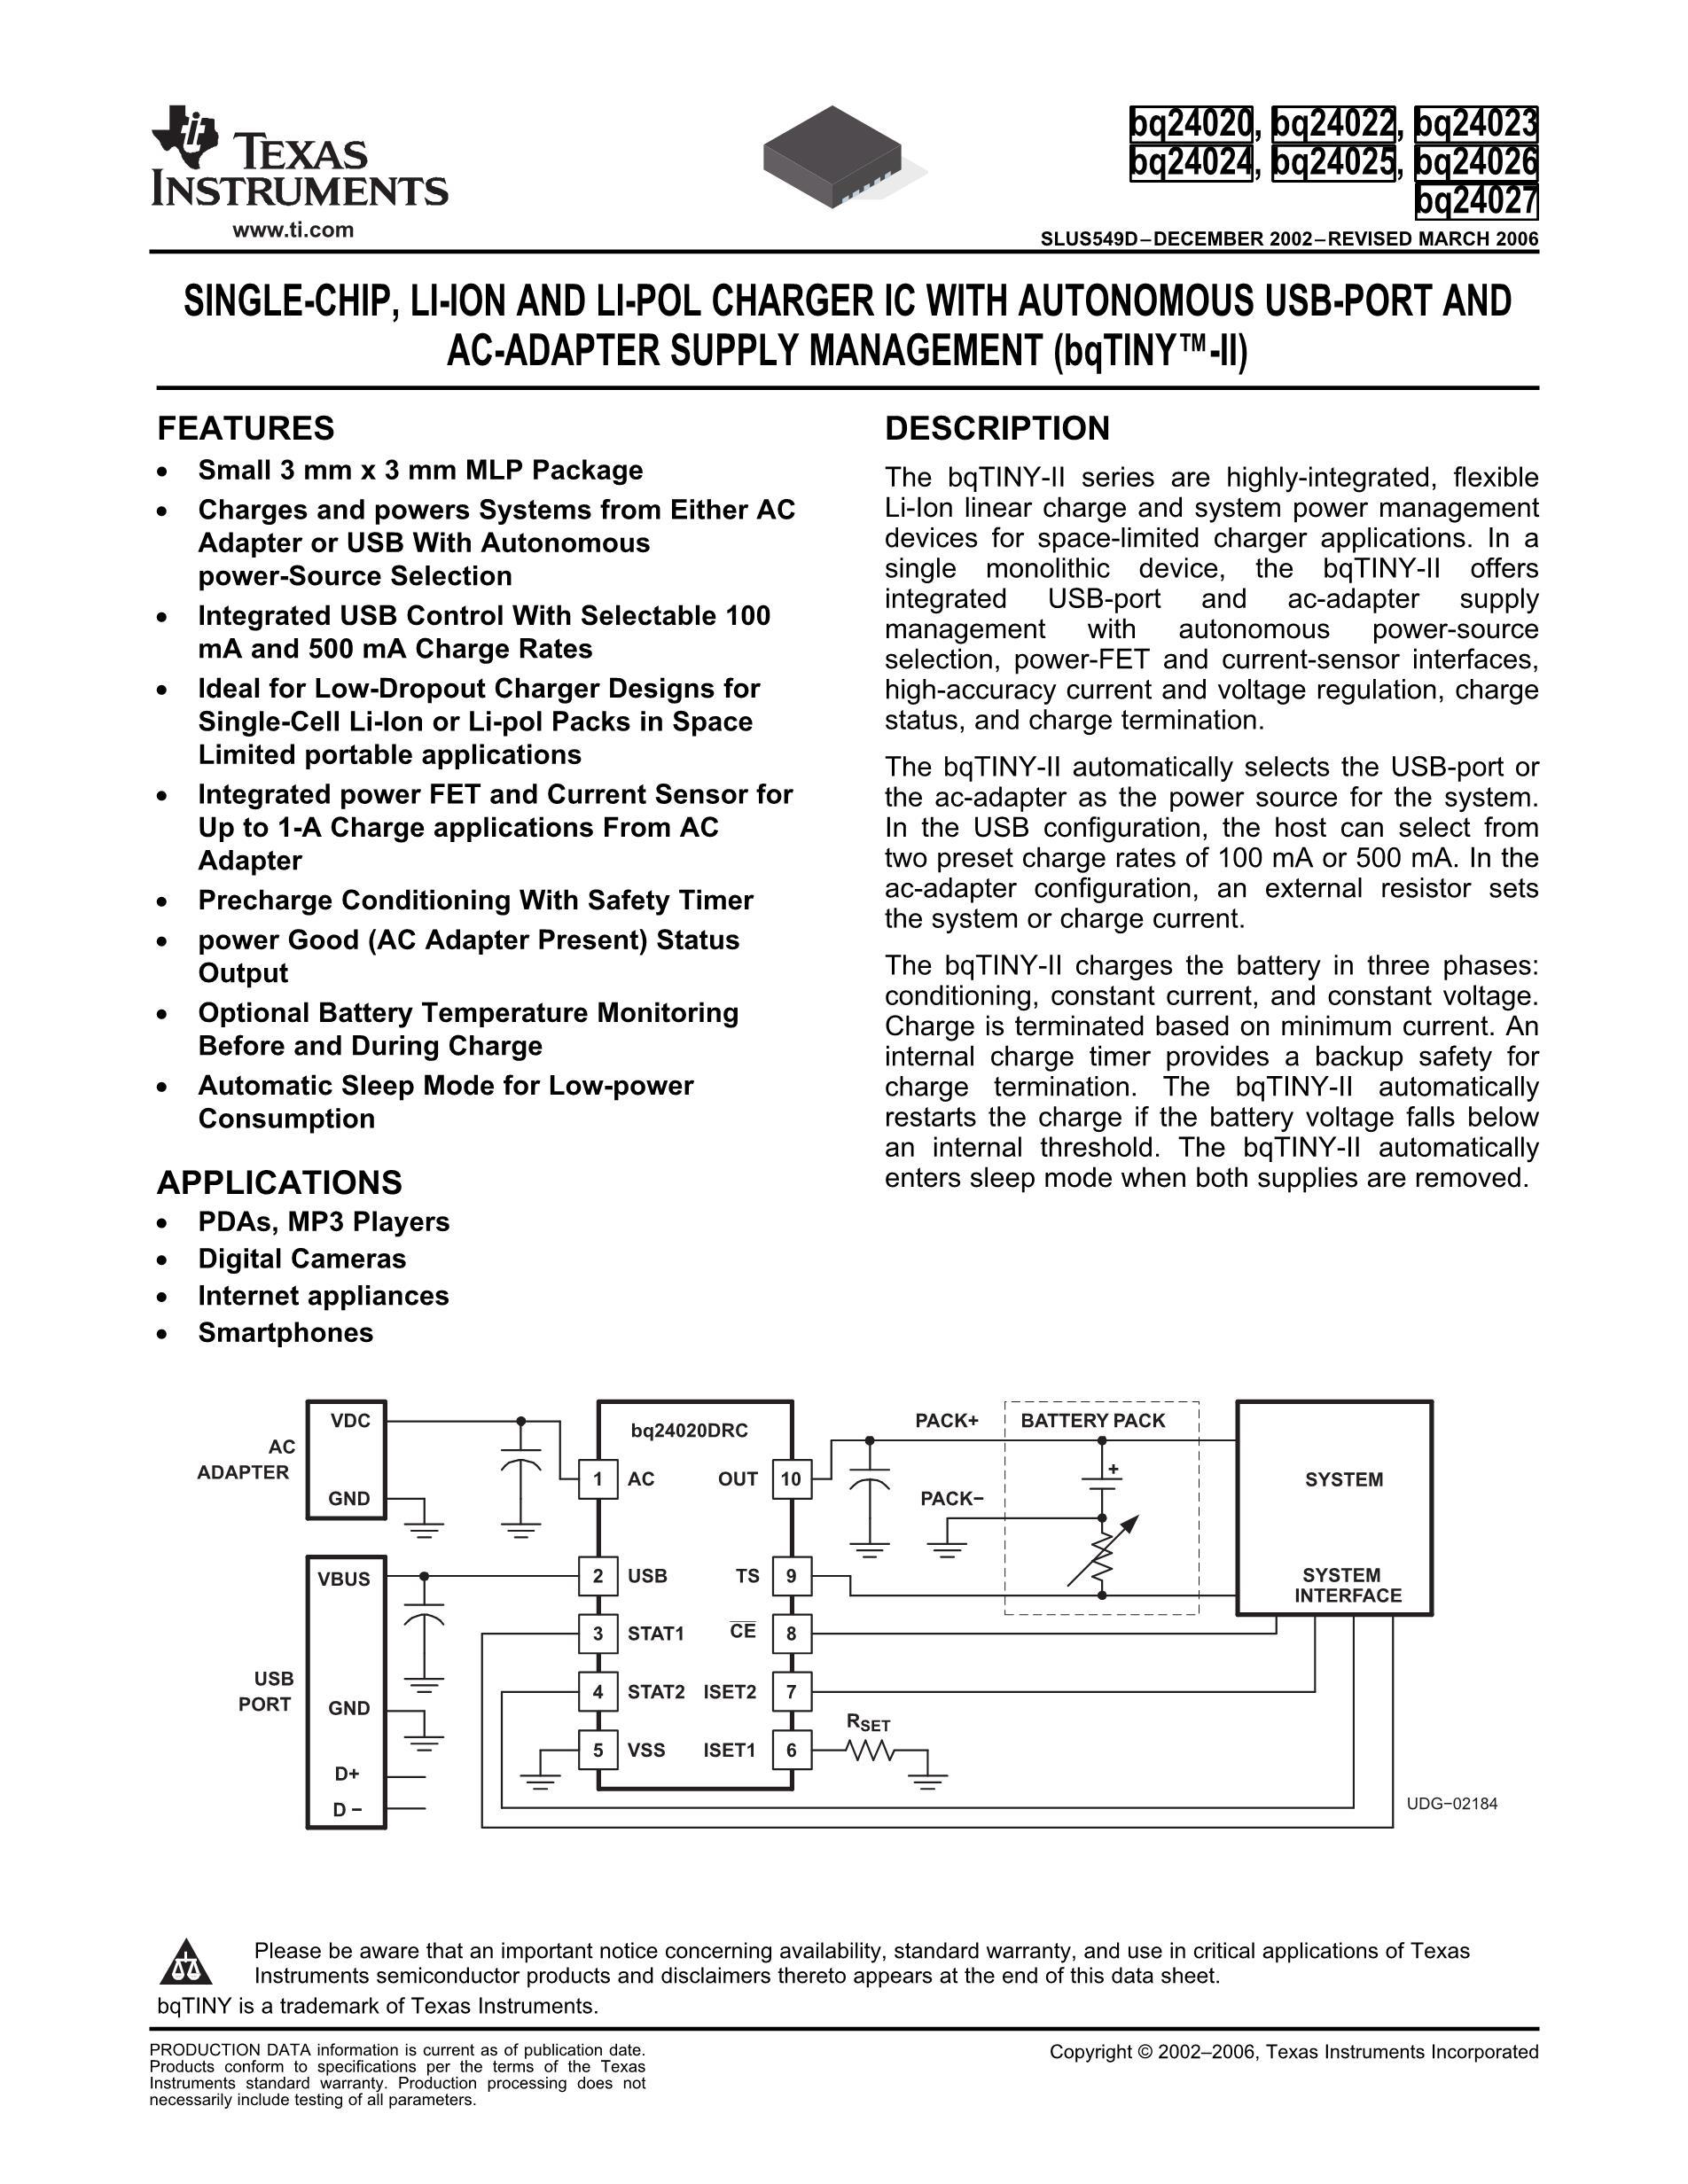 BQ24261MRGER's pdf picture 1